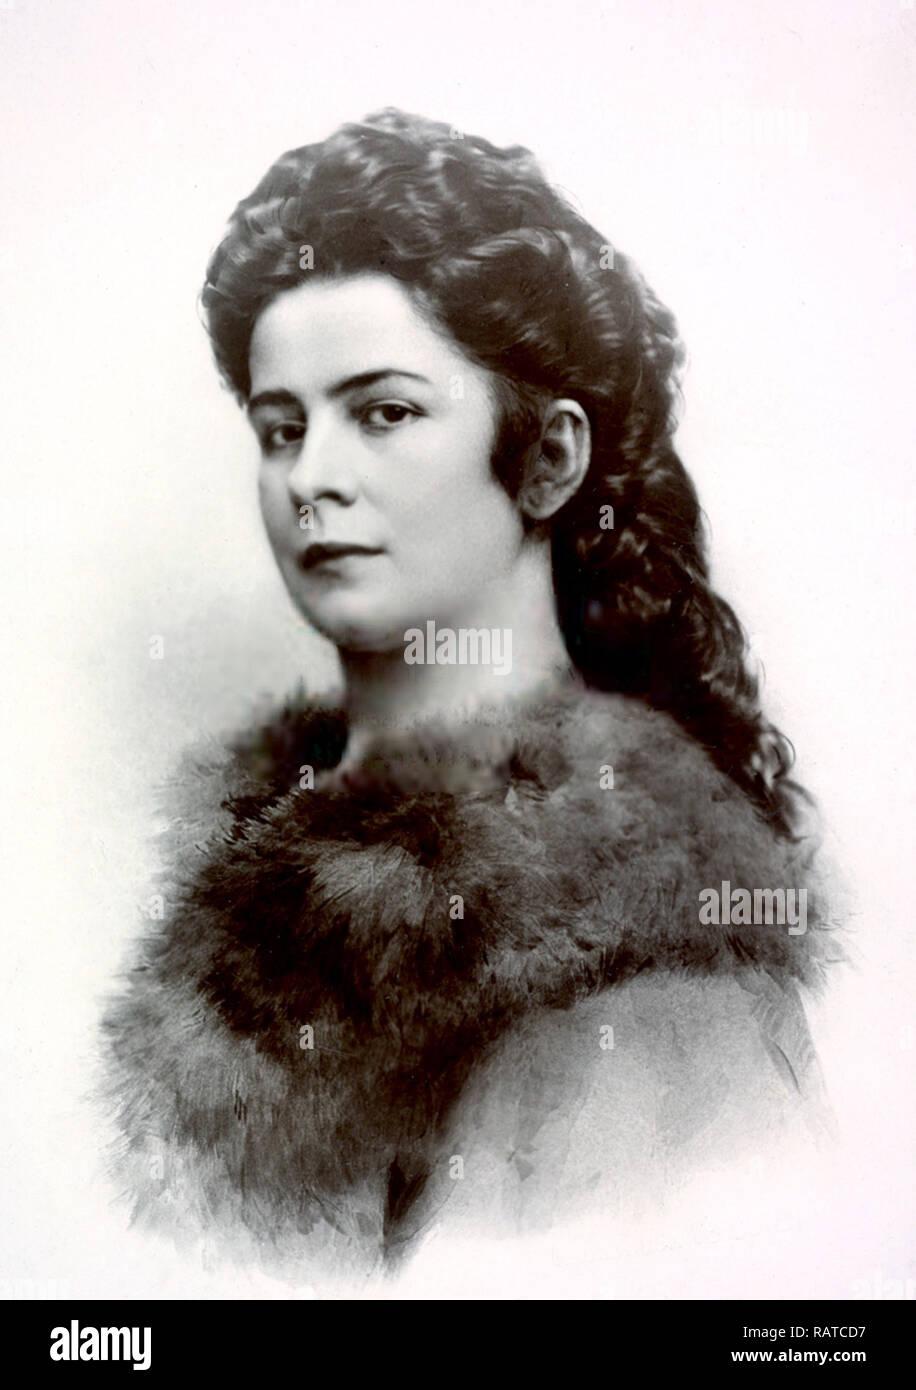 Empress Elisabeth of Austria, Elisabeth of Austria (1837 – 1898) Empress of Austria and Queen of Hungary, marriage to Emperor Franz Joseph I. - Stock Image